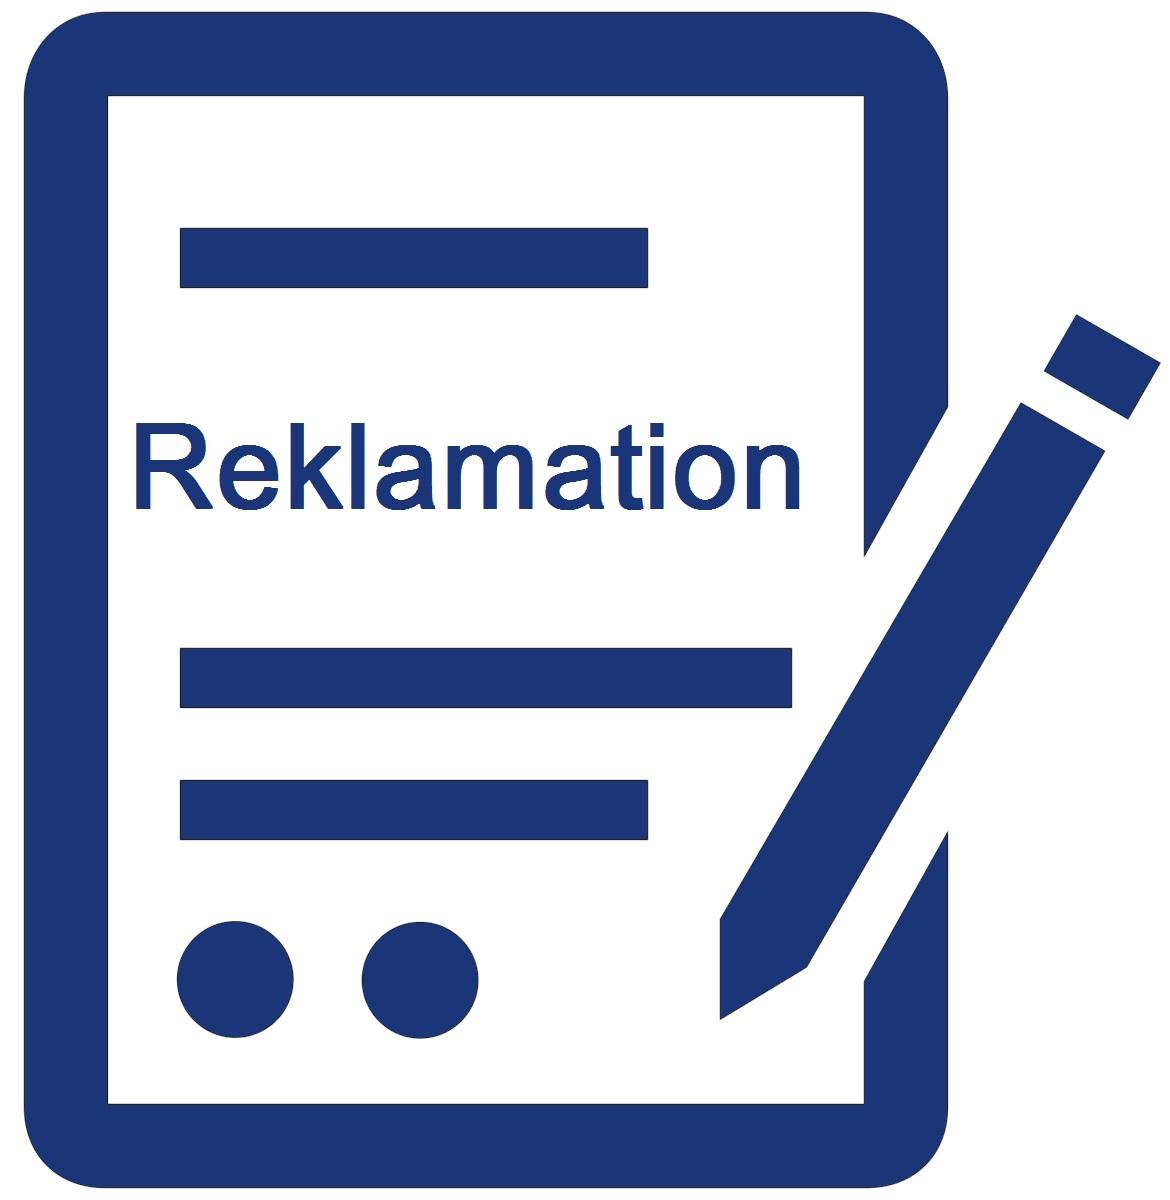 reklamation_icon